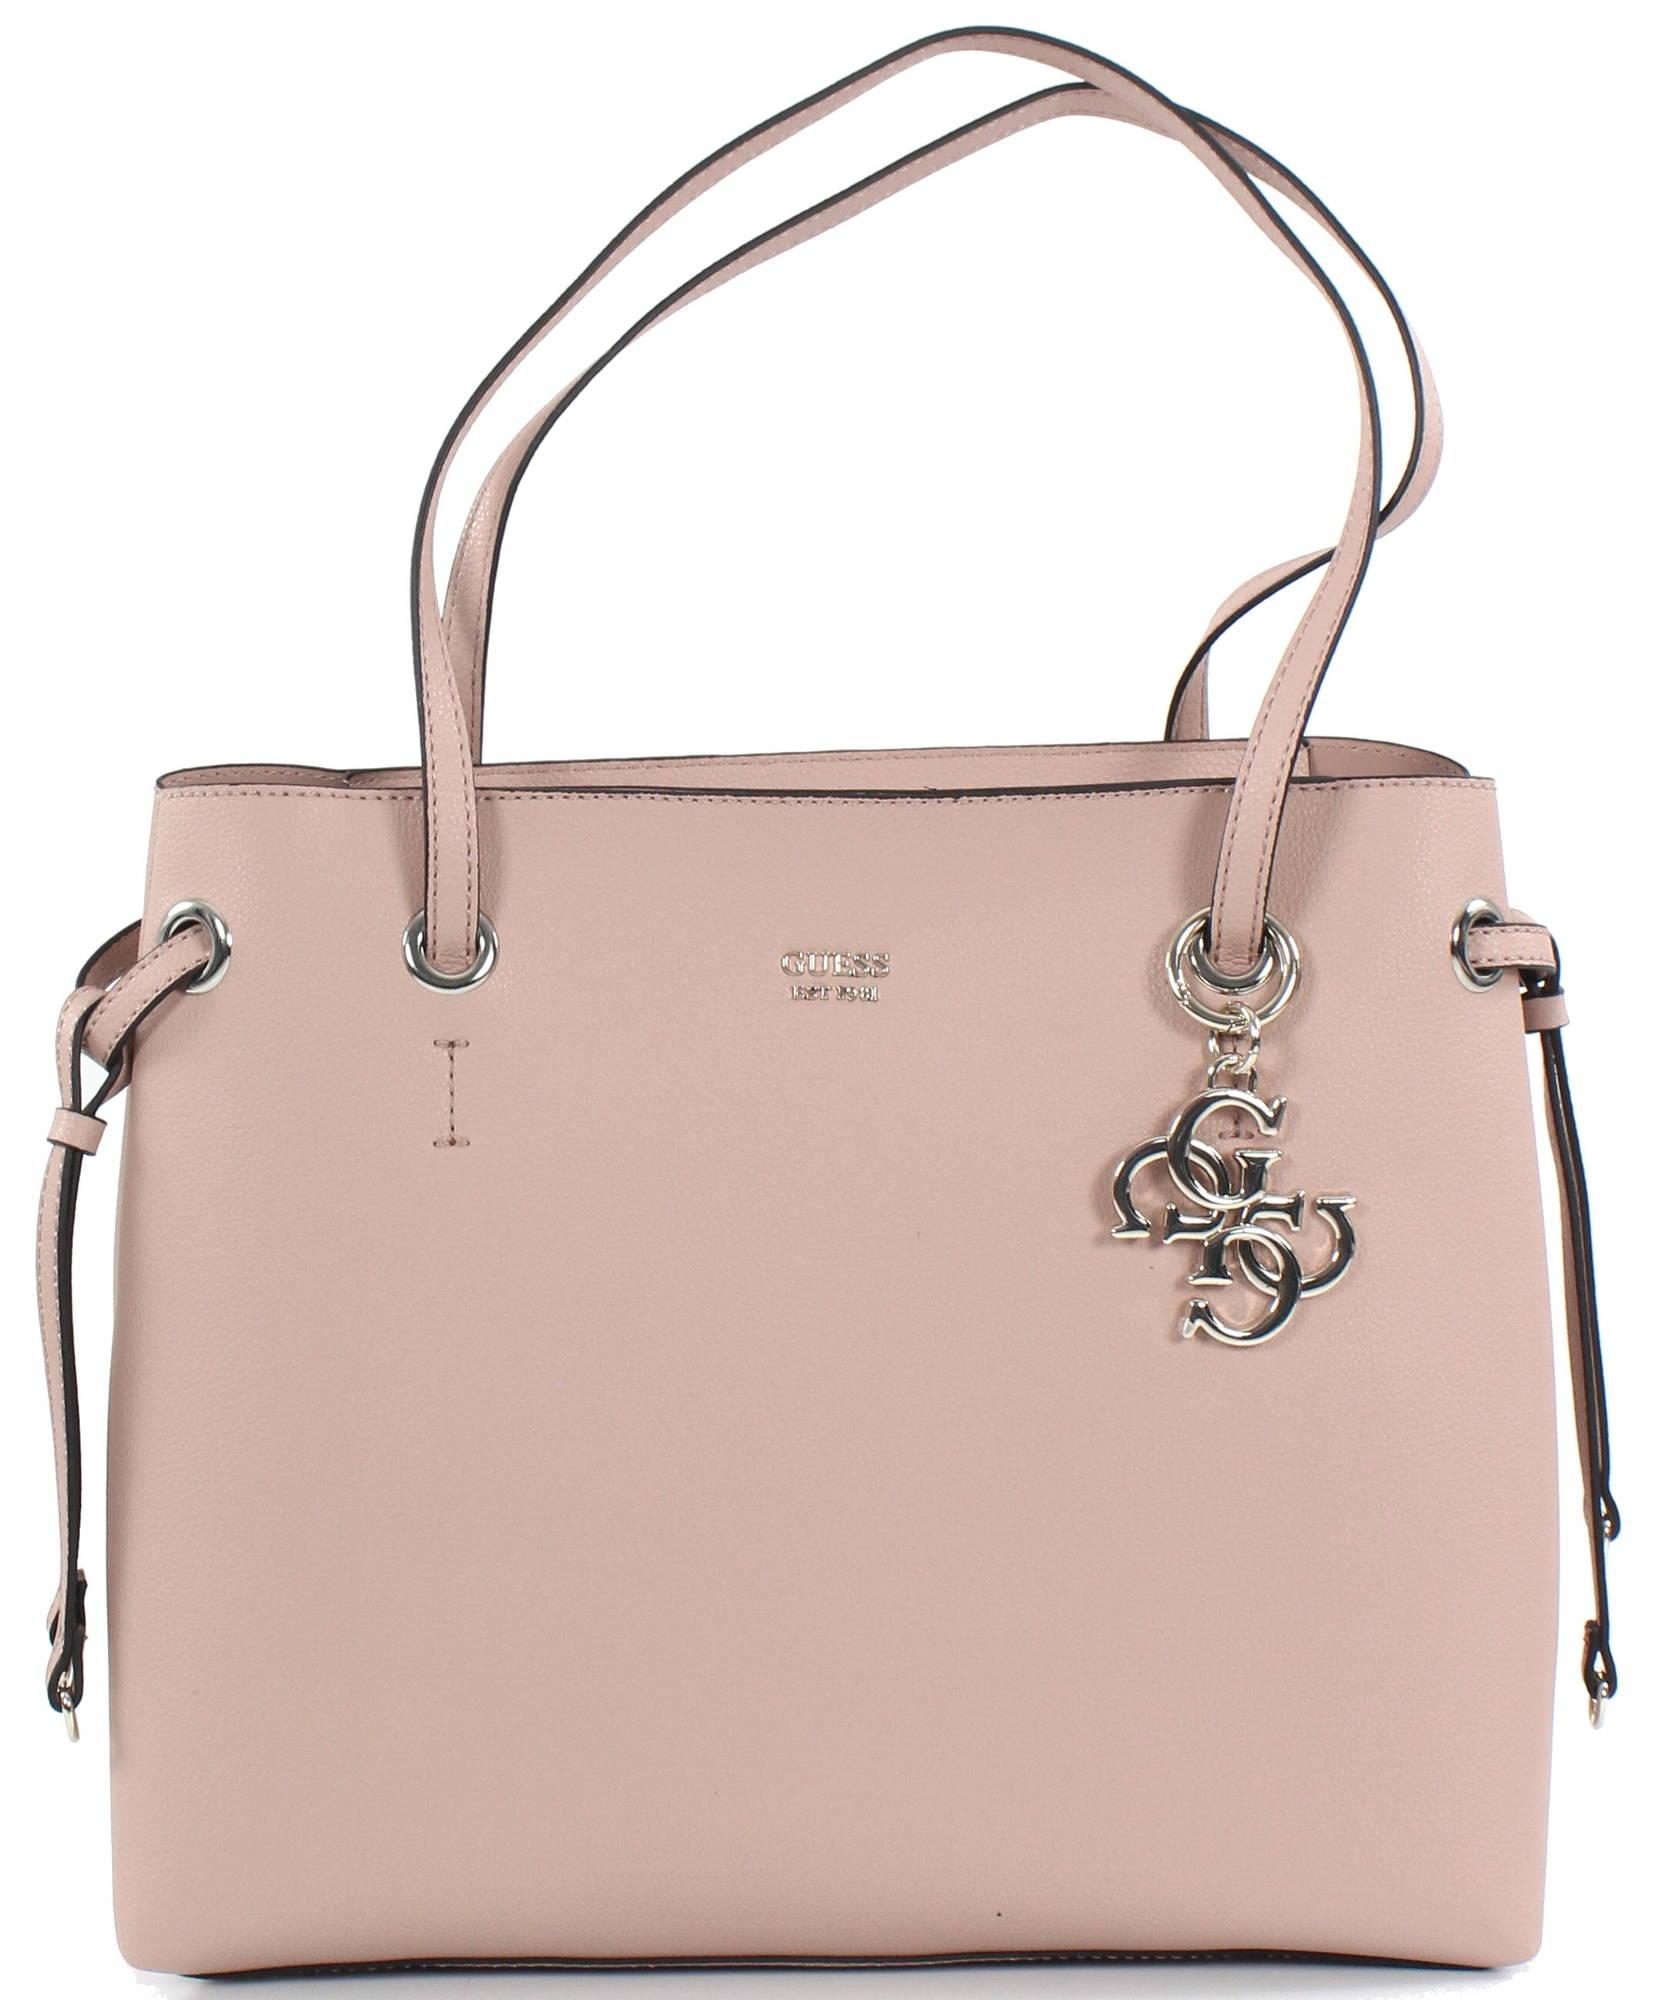 guess väska rosa